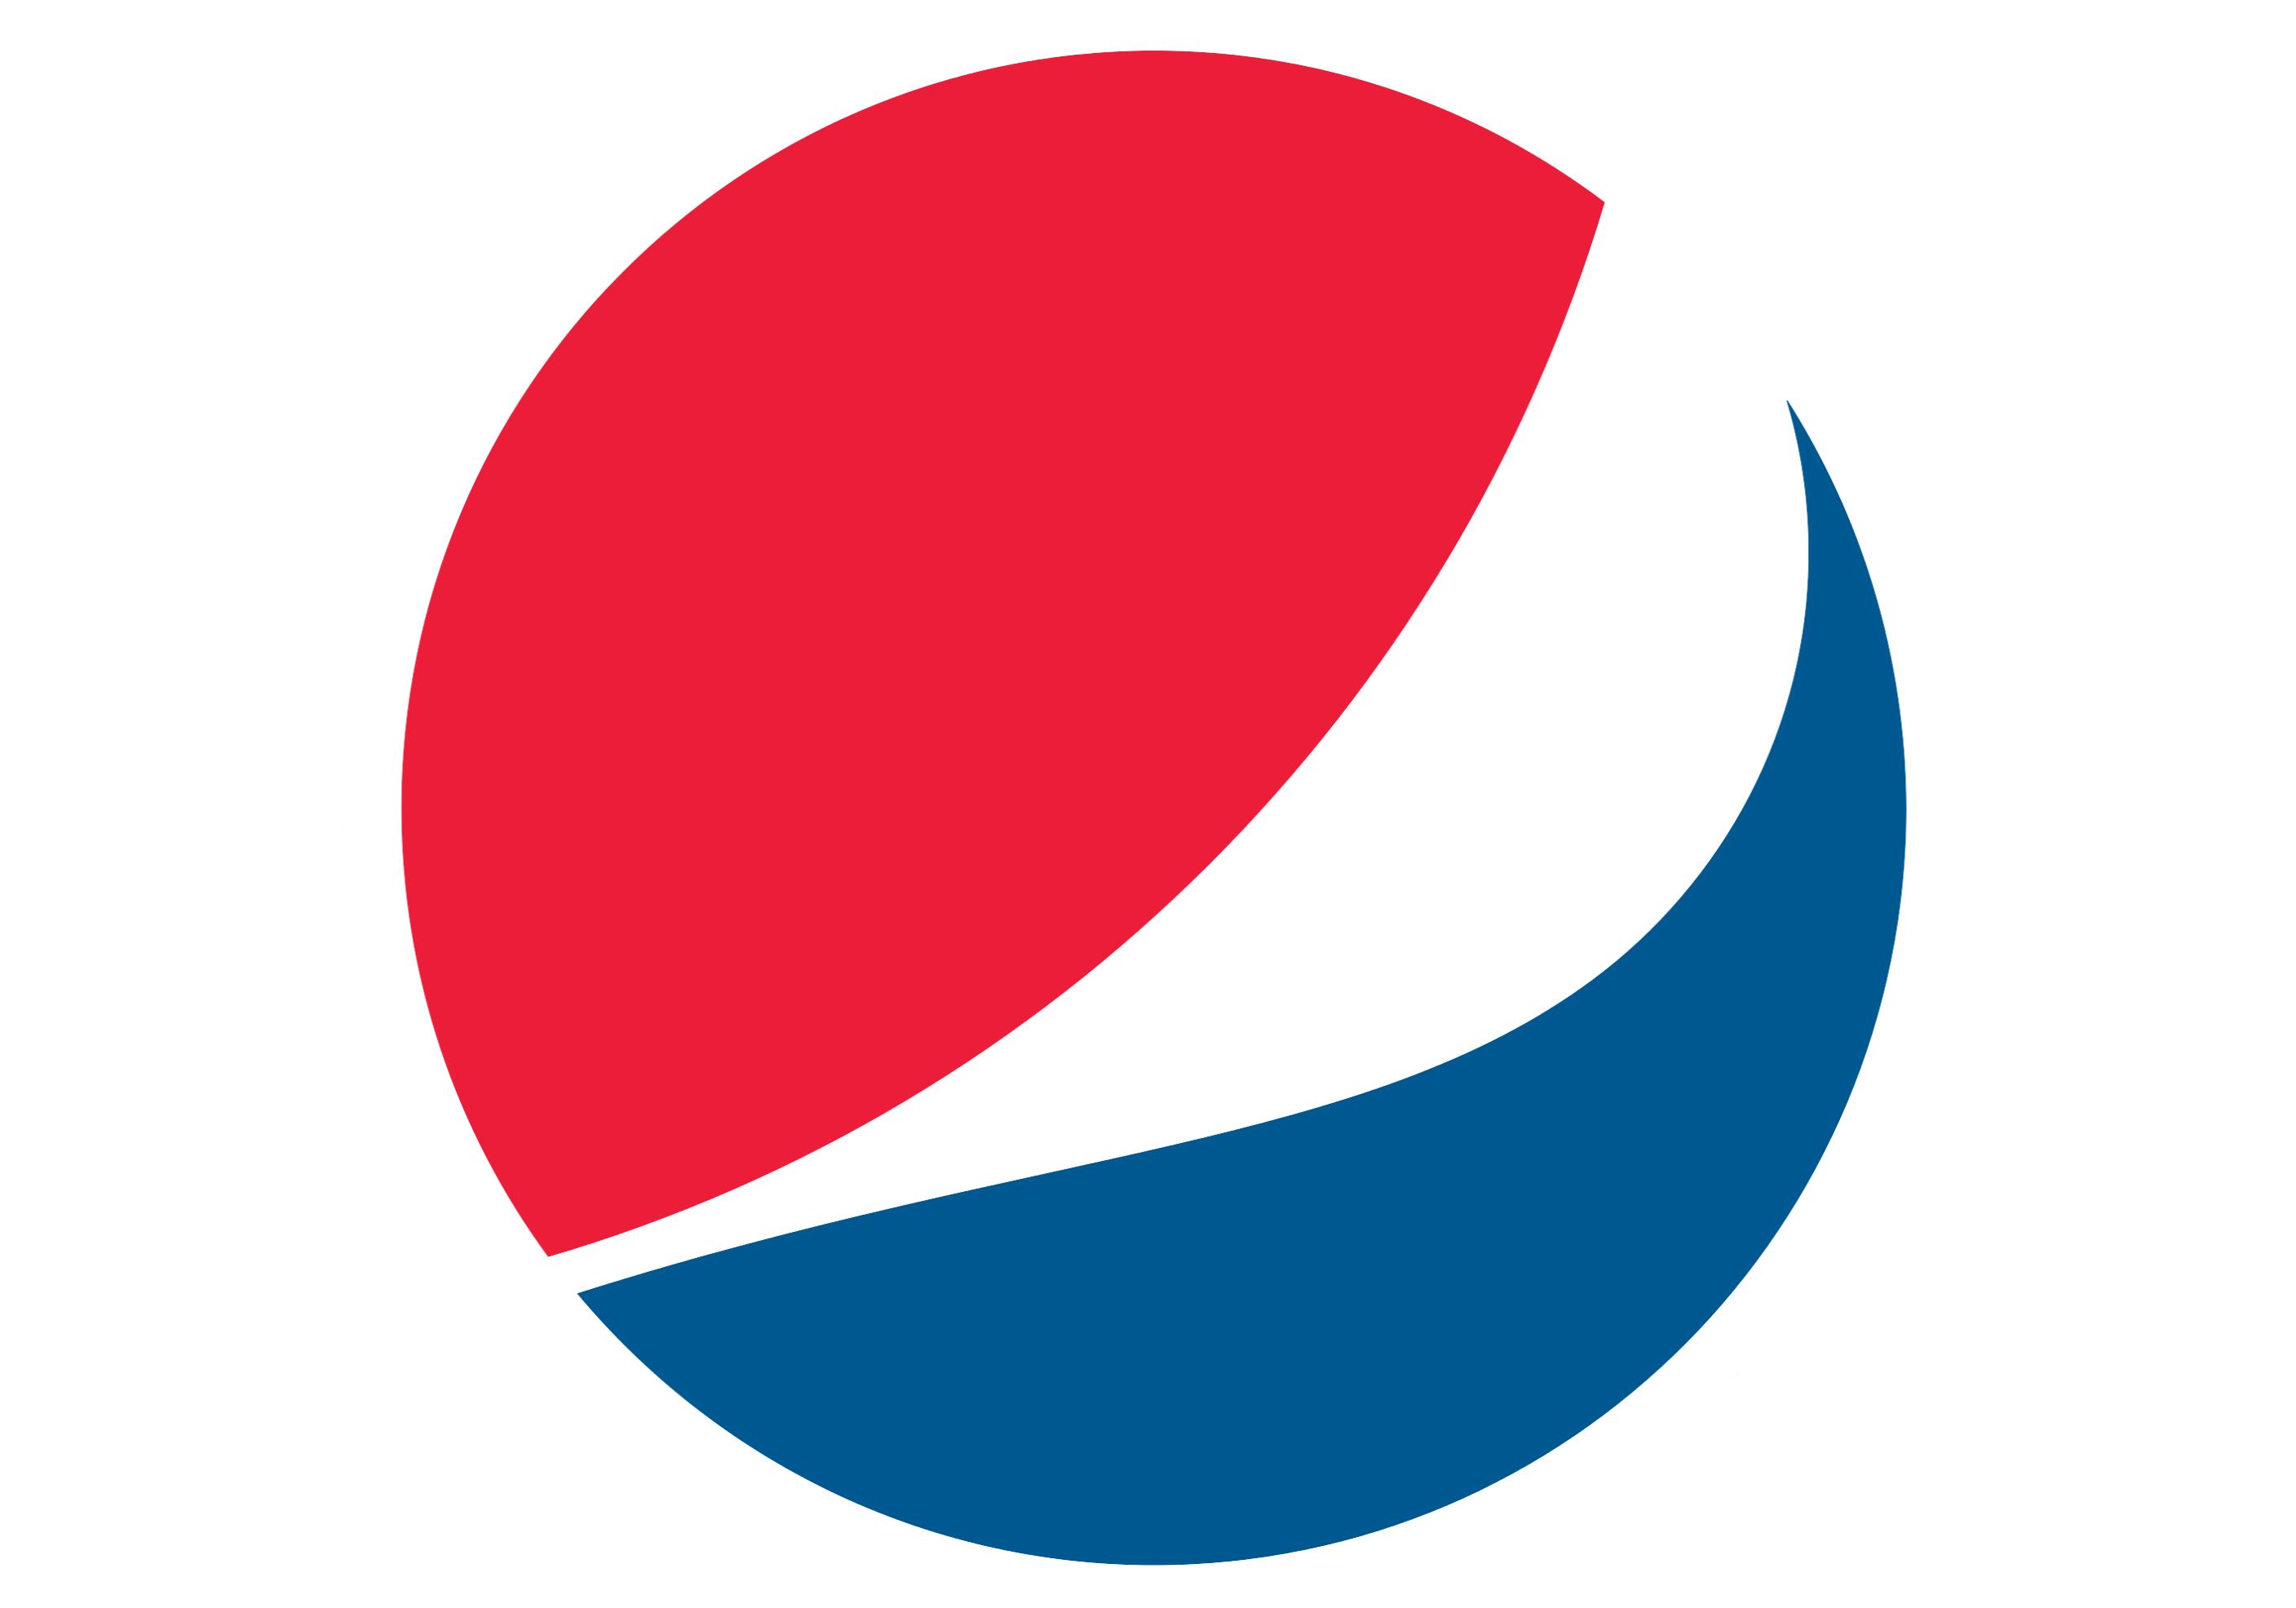 The Pepsi Challenge - CCS Insight